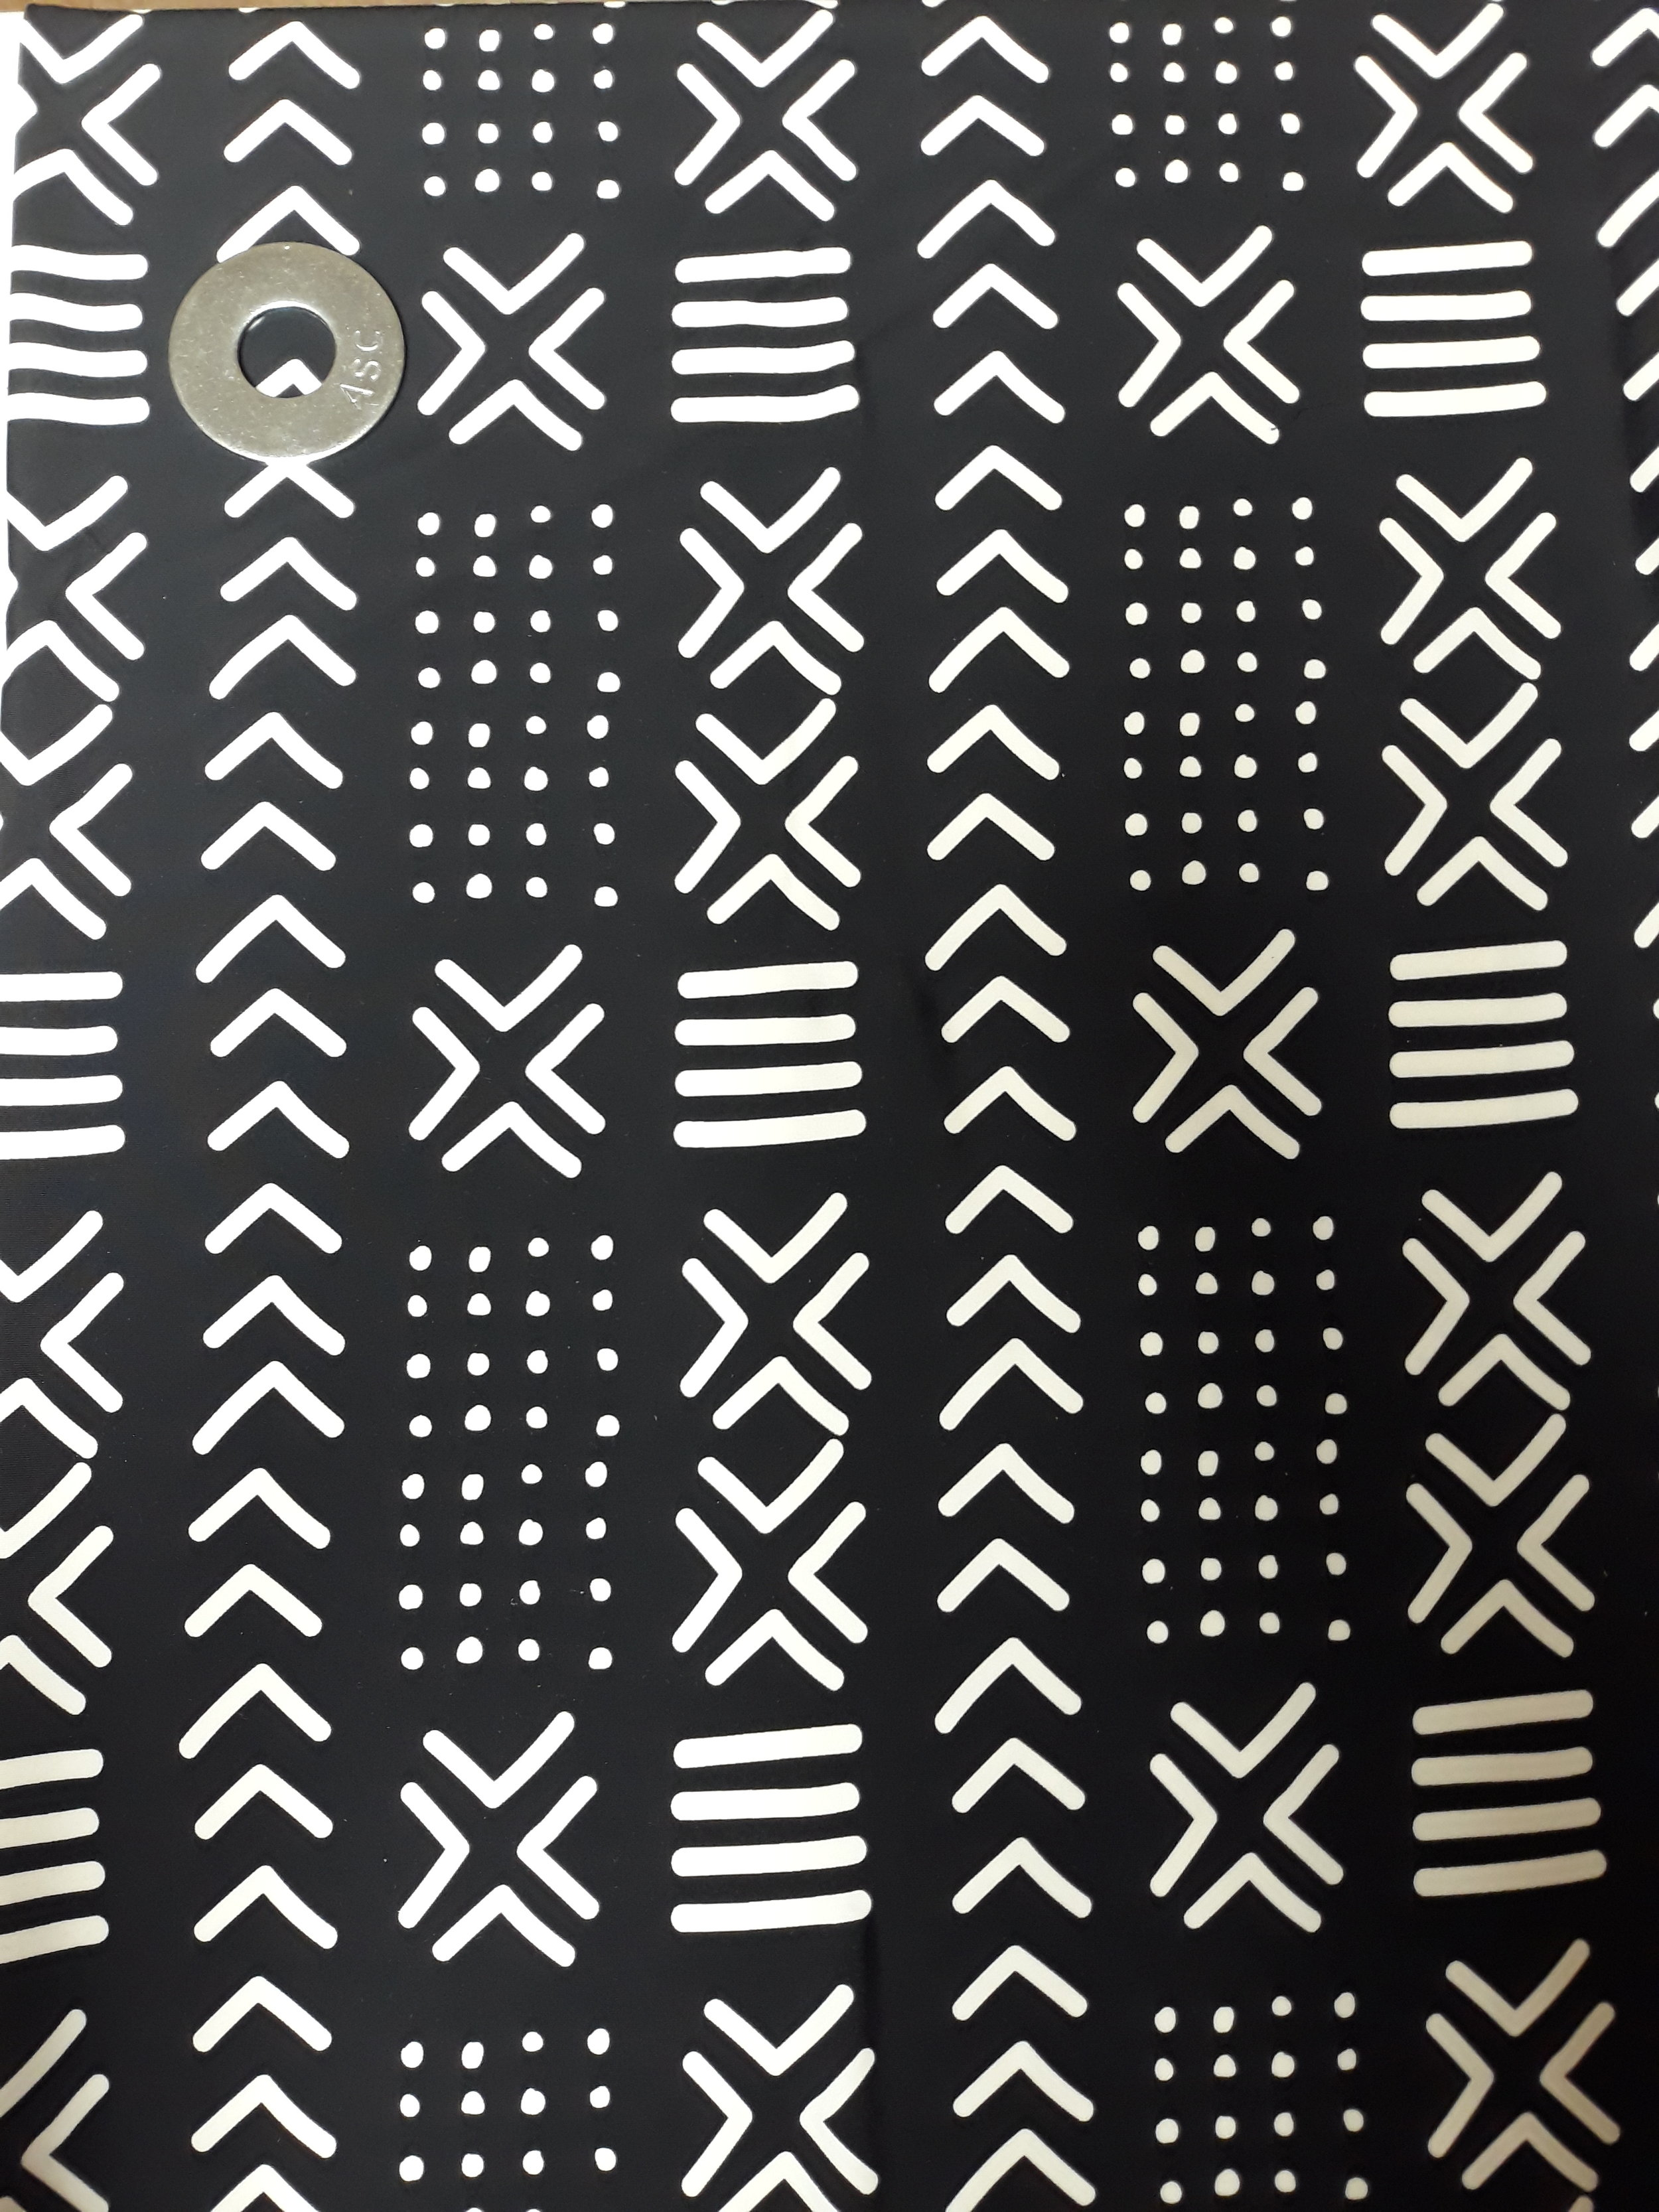 aed06b233a61 4 Way Stretch Black White Mudcloth #1 African Print Fabric BTY ...